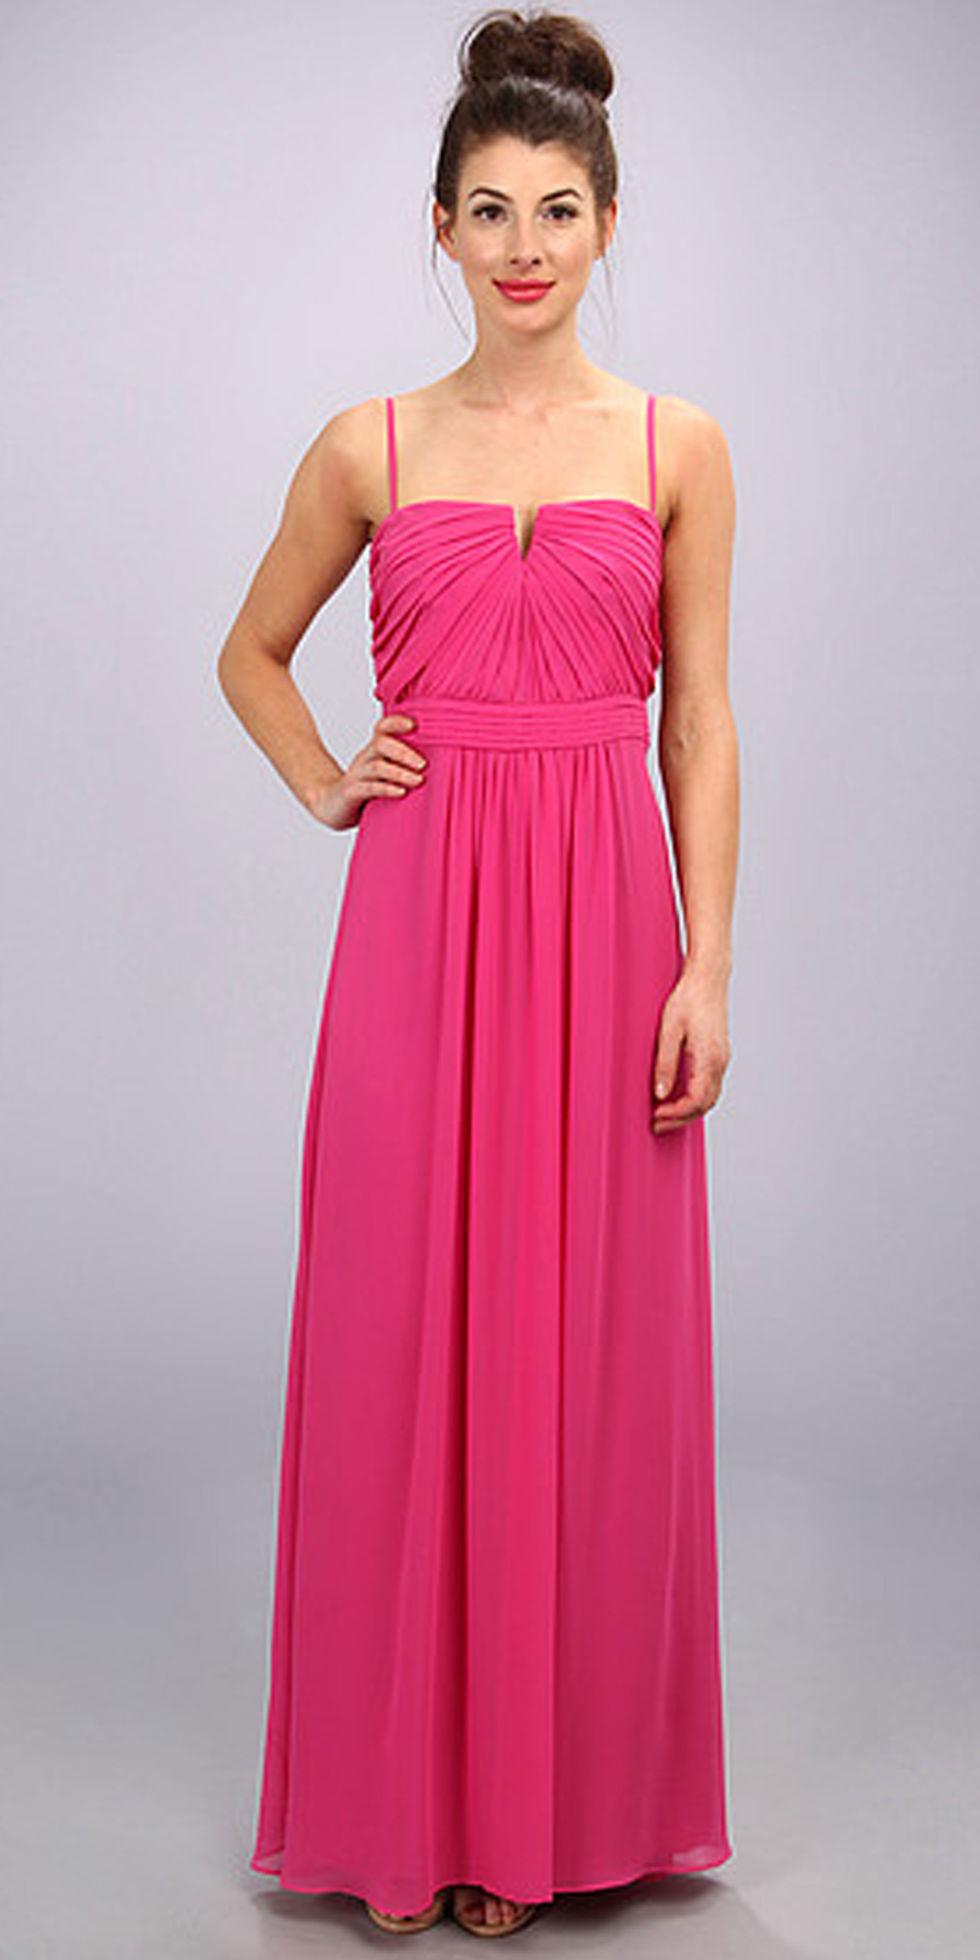 Great Prom Dresses Lubbock Tx Photos - Wedding Dress Ideas - unijna.info